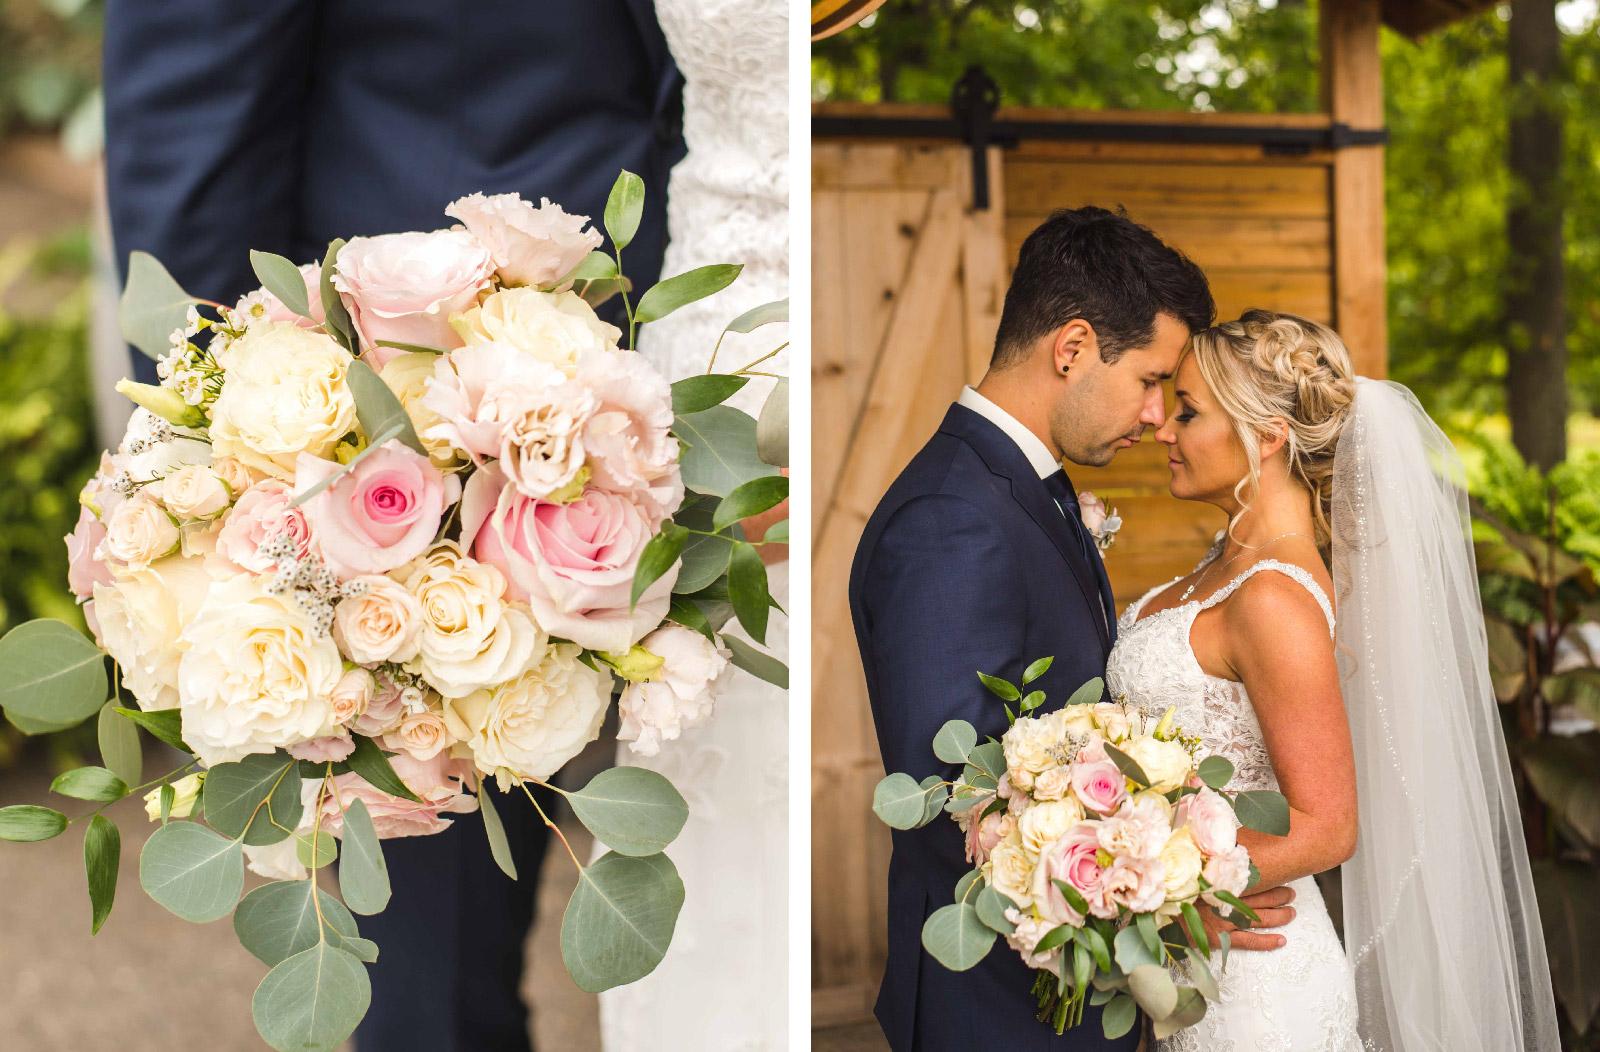 Eli & michelle's Flower details Hush Hush Photography & Film Aidan Hennebry Hamilton Wedding Photographer Videographer-01.jpg